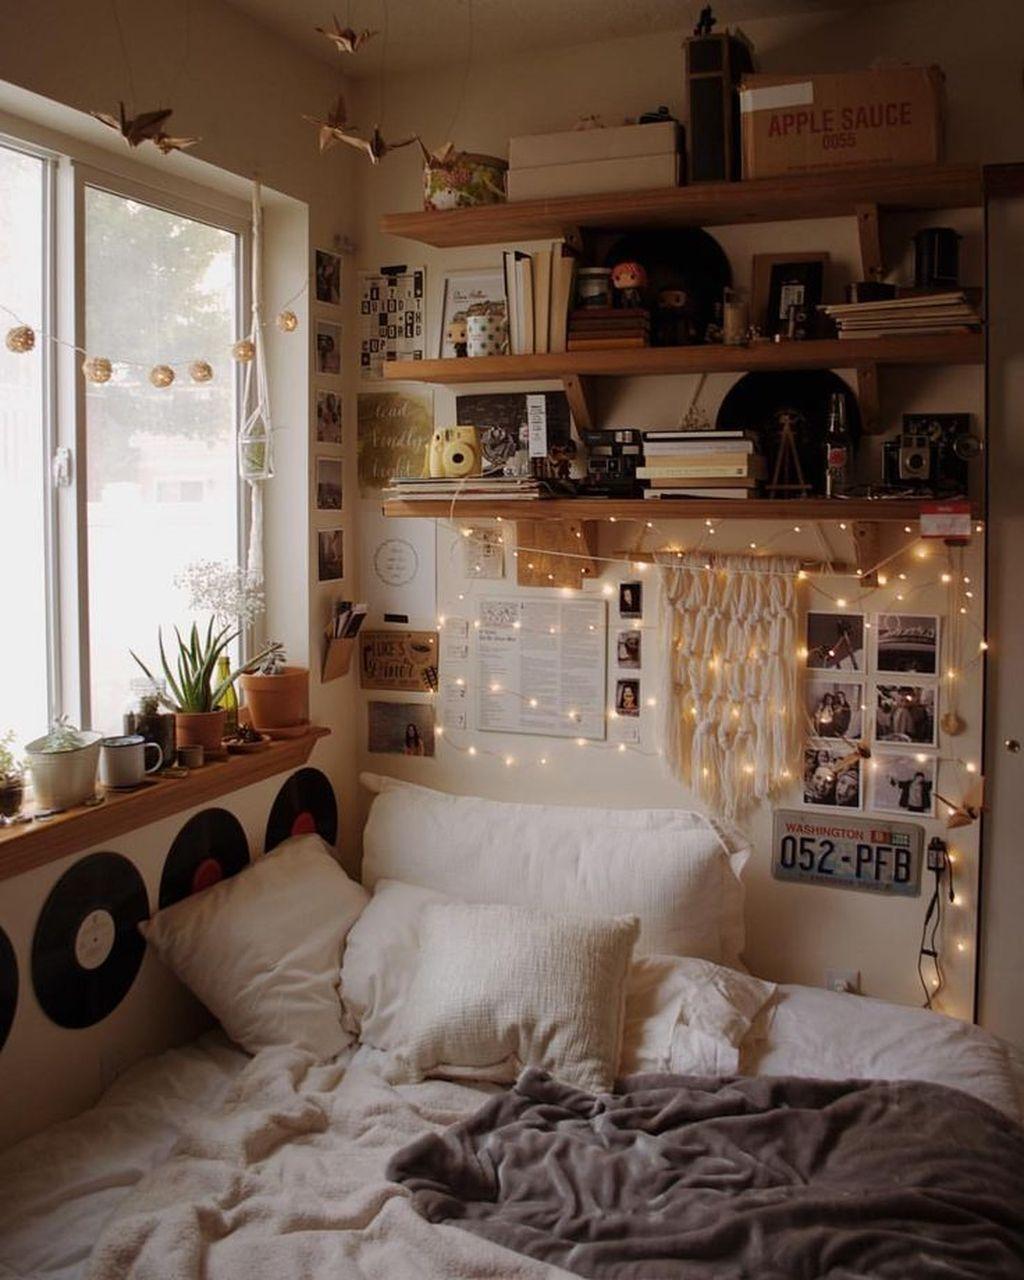 43 Delightful Teen Girls Room Decorating Ideas images